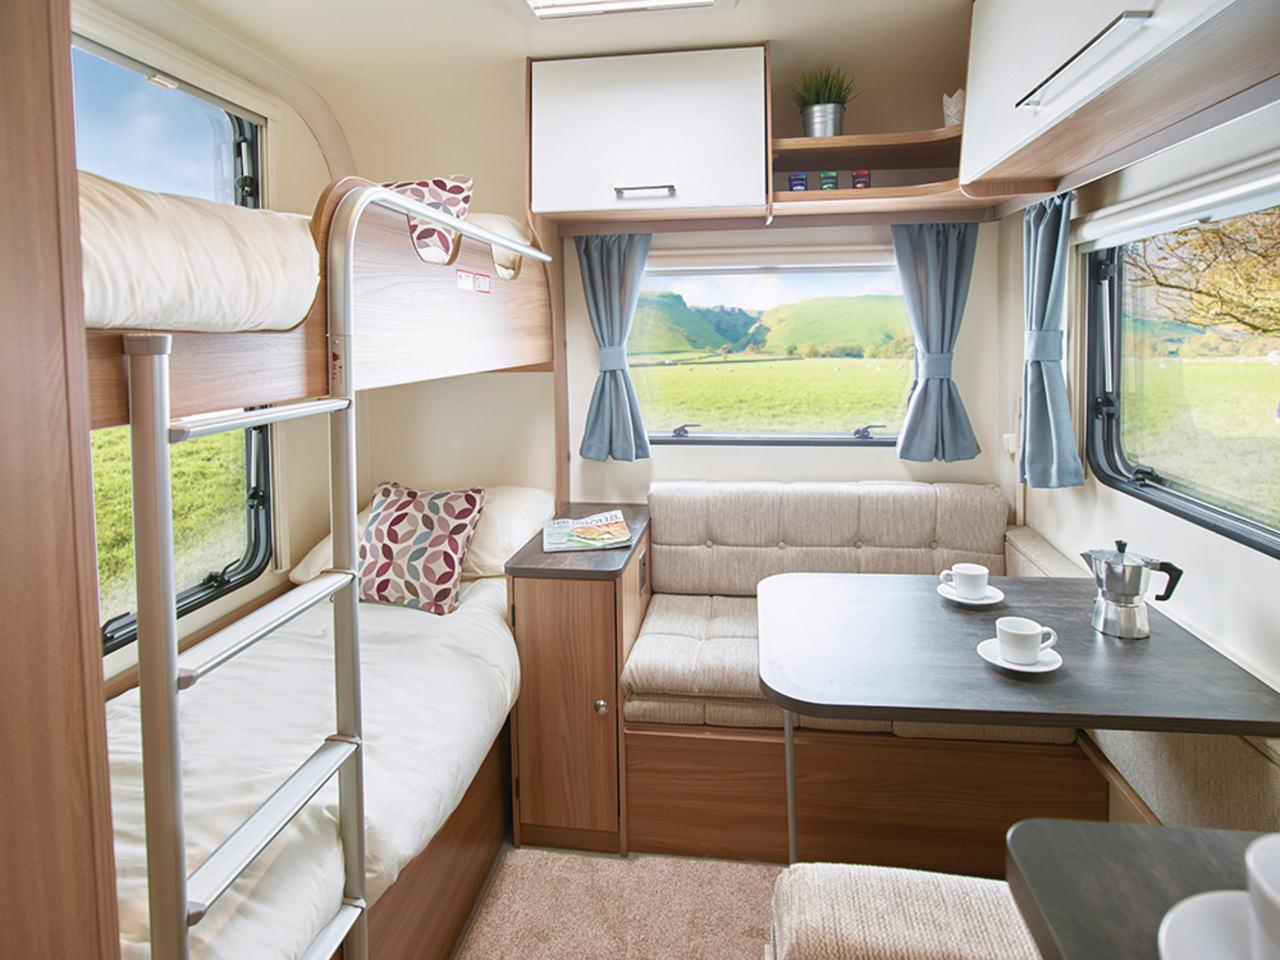 Bailey Pursuit 2 570 6 2017 Caravan 6 Ber